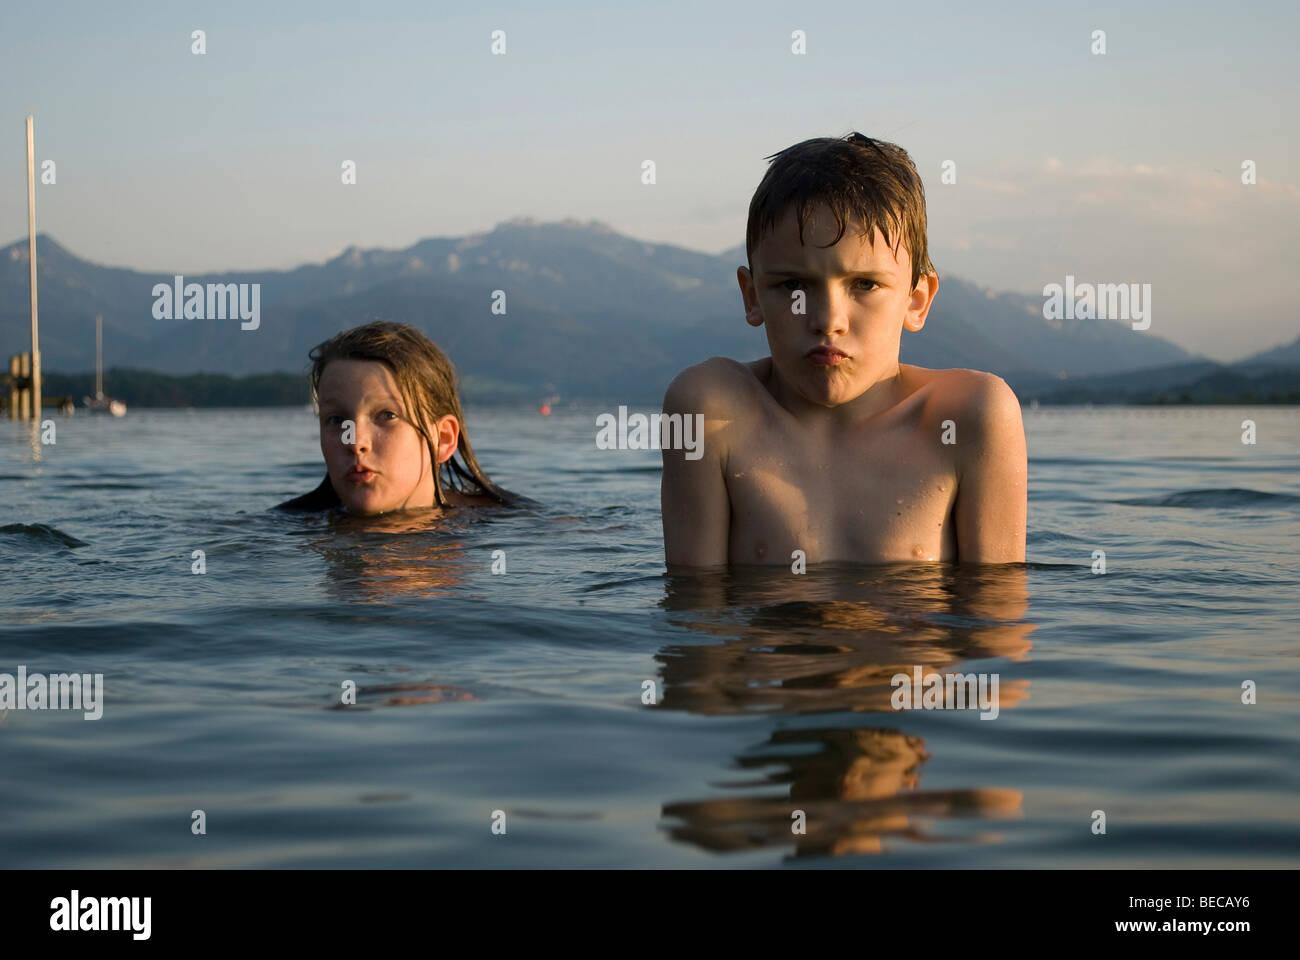 Children swimming in Lake Chiemsee, Bavaria, Germany, Europe - Stock Image